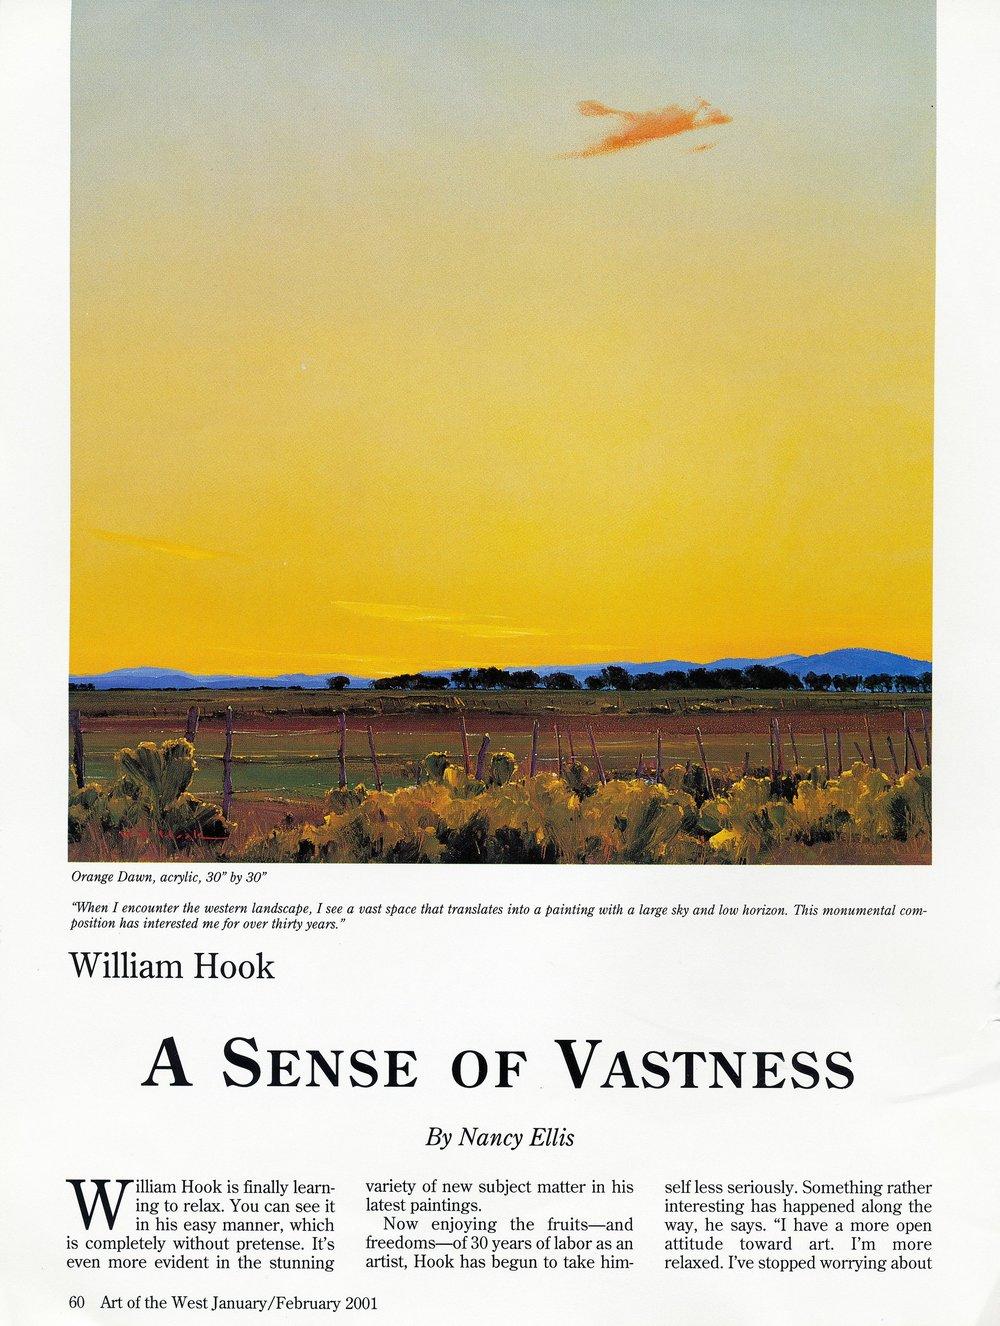 art of the west 2001.jpg